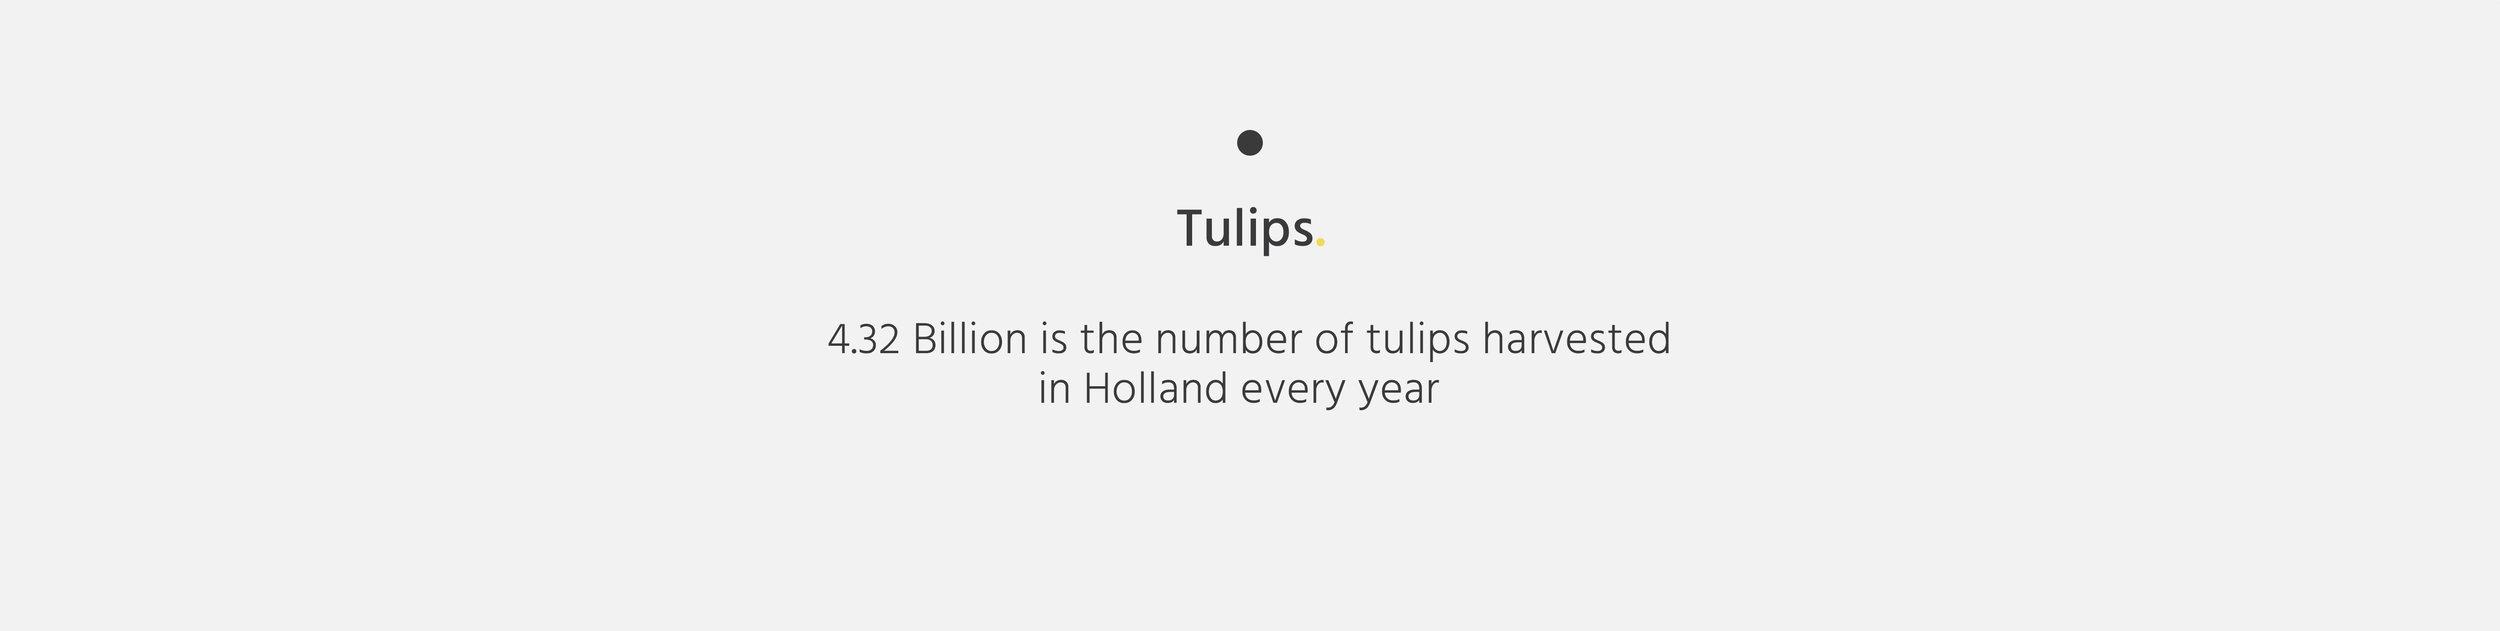 TextBlock_Tulips.jpg